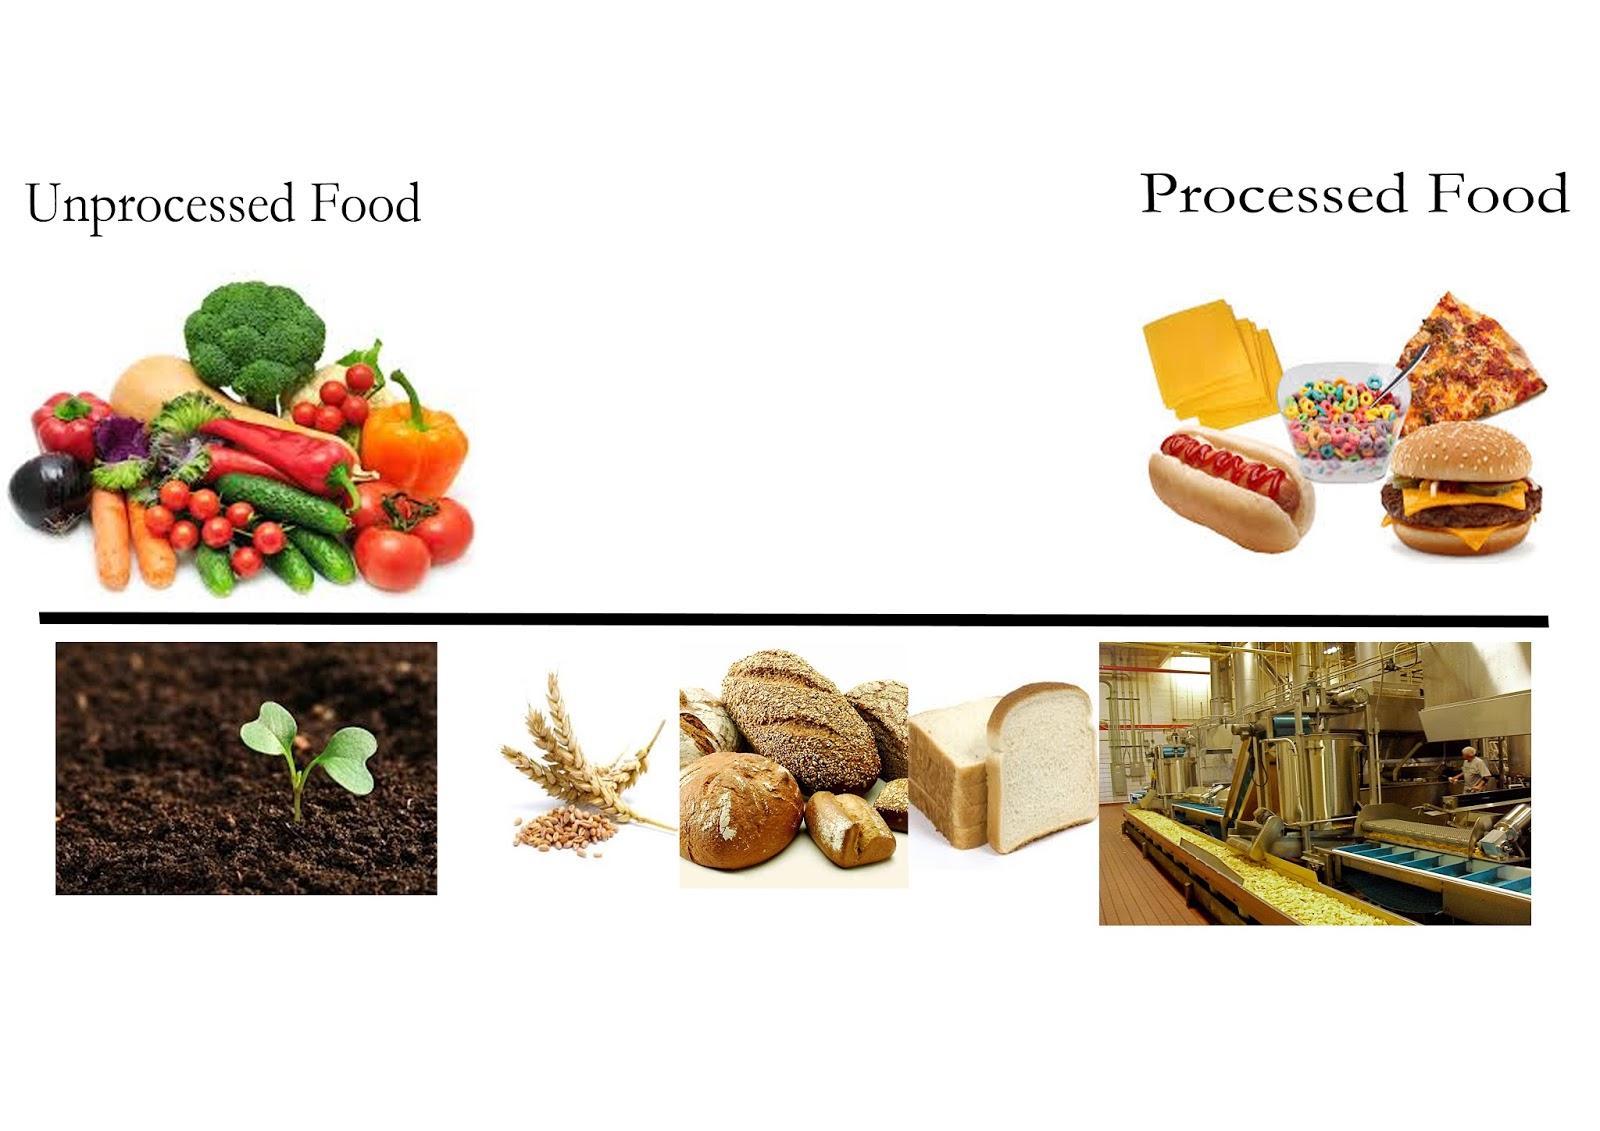 whole foods versus processed foods